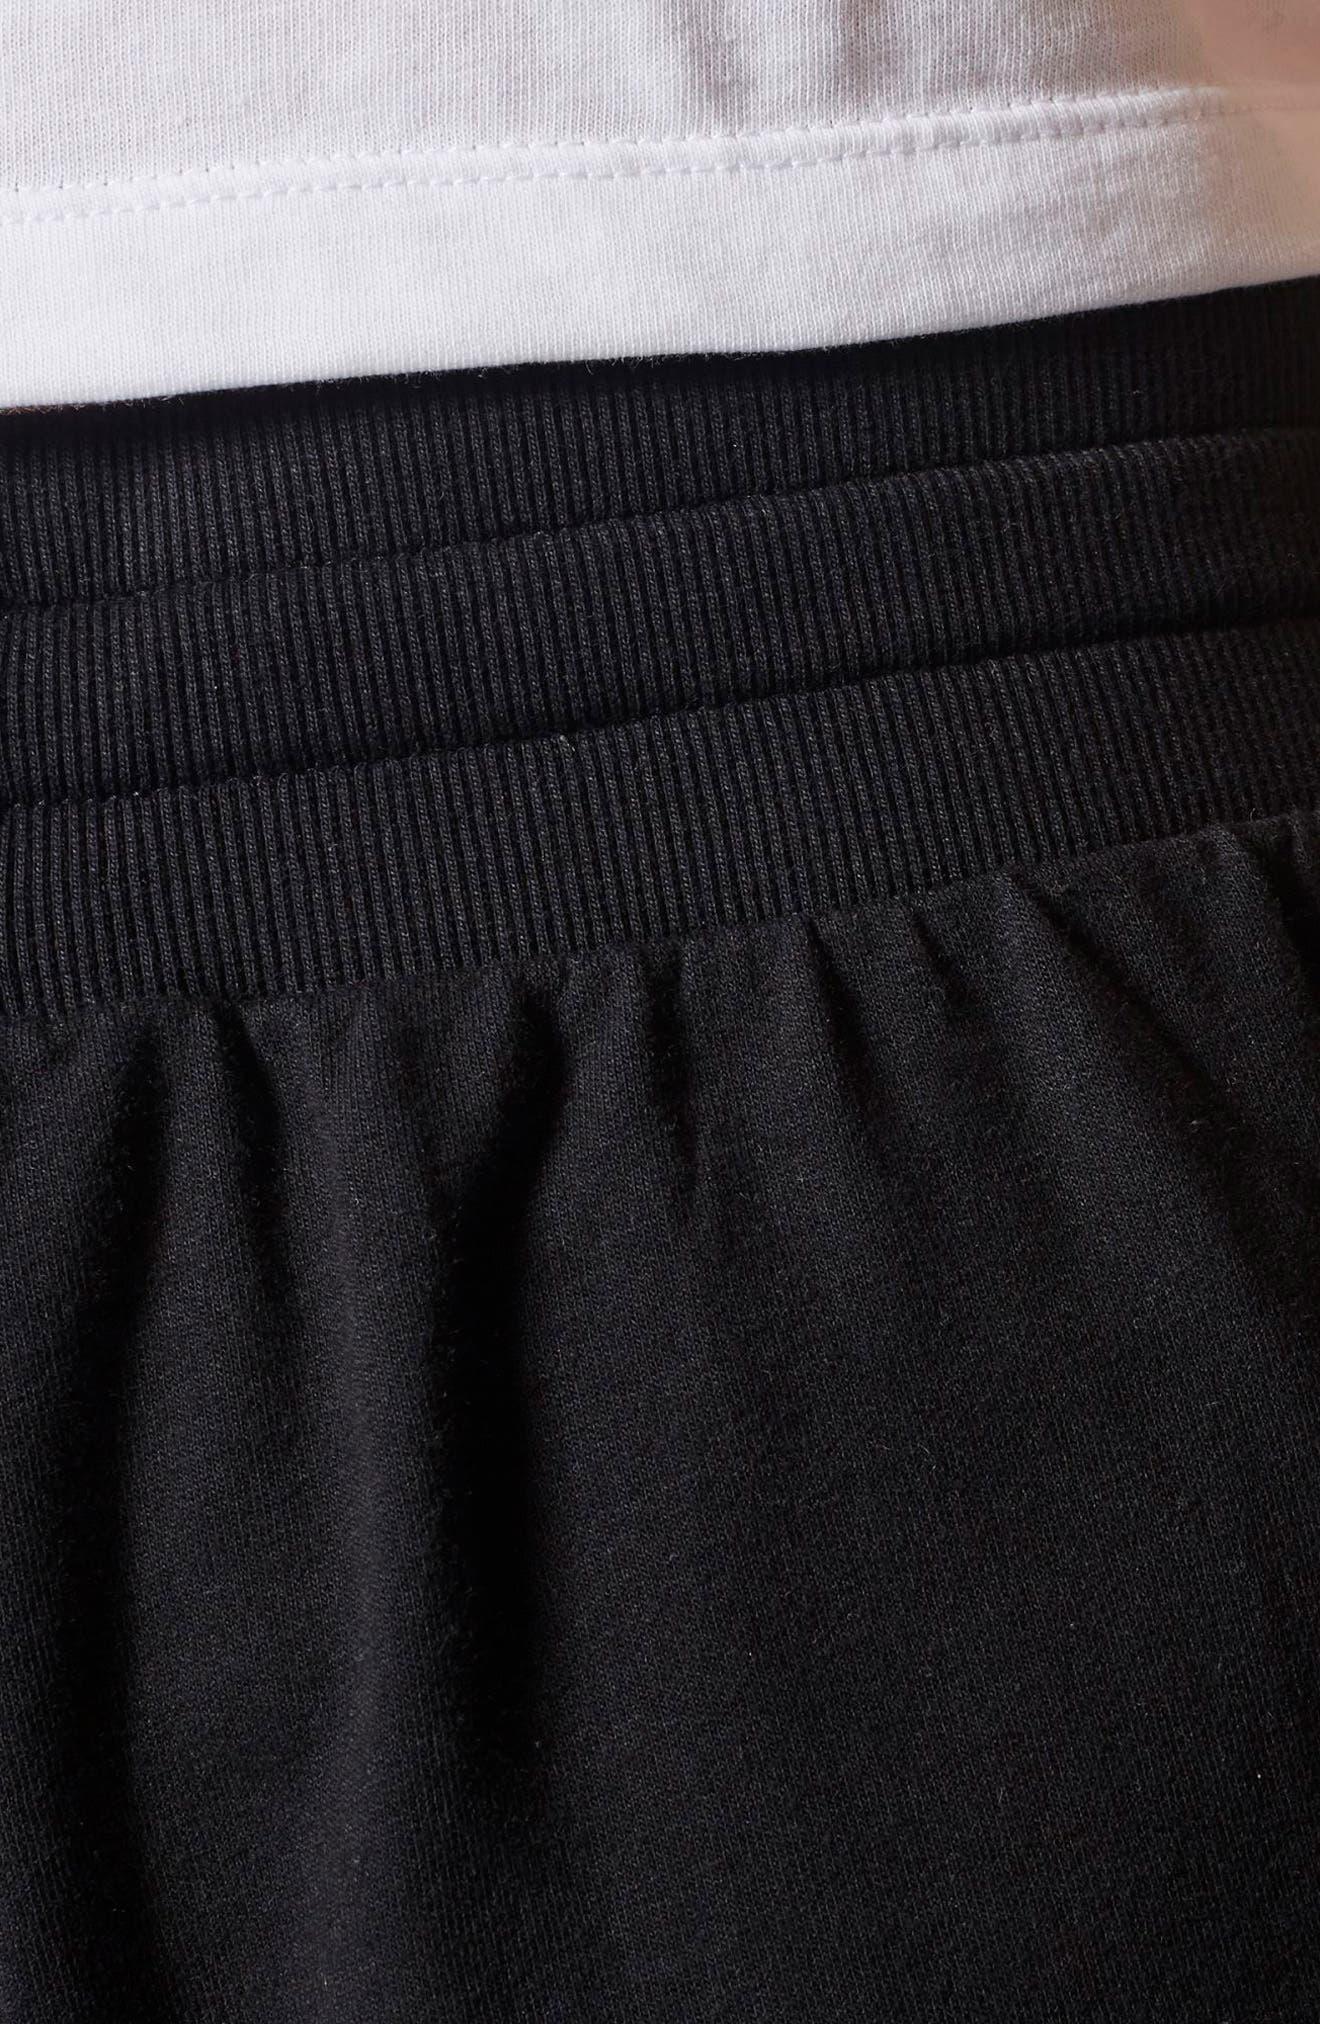 3-Stripes Tapered Pants,                             Alternate thumbnail 7, color,                             001